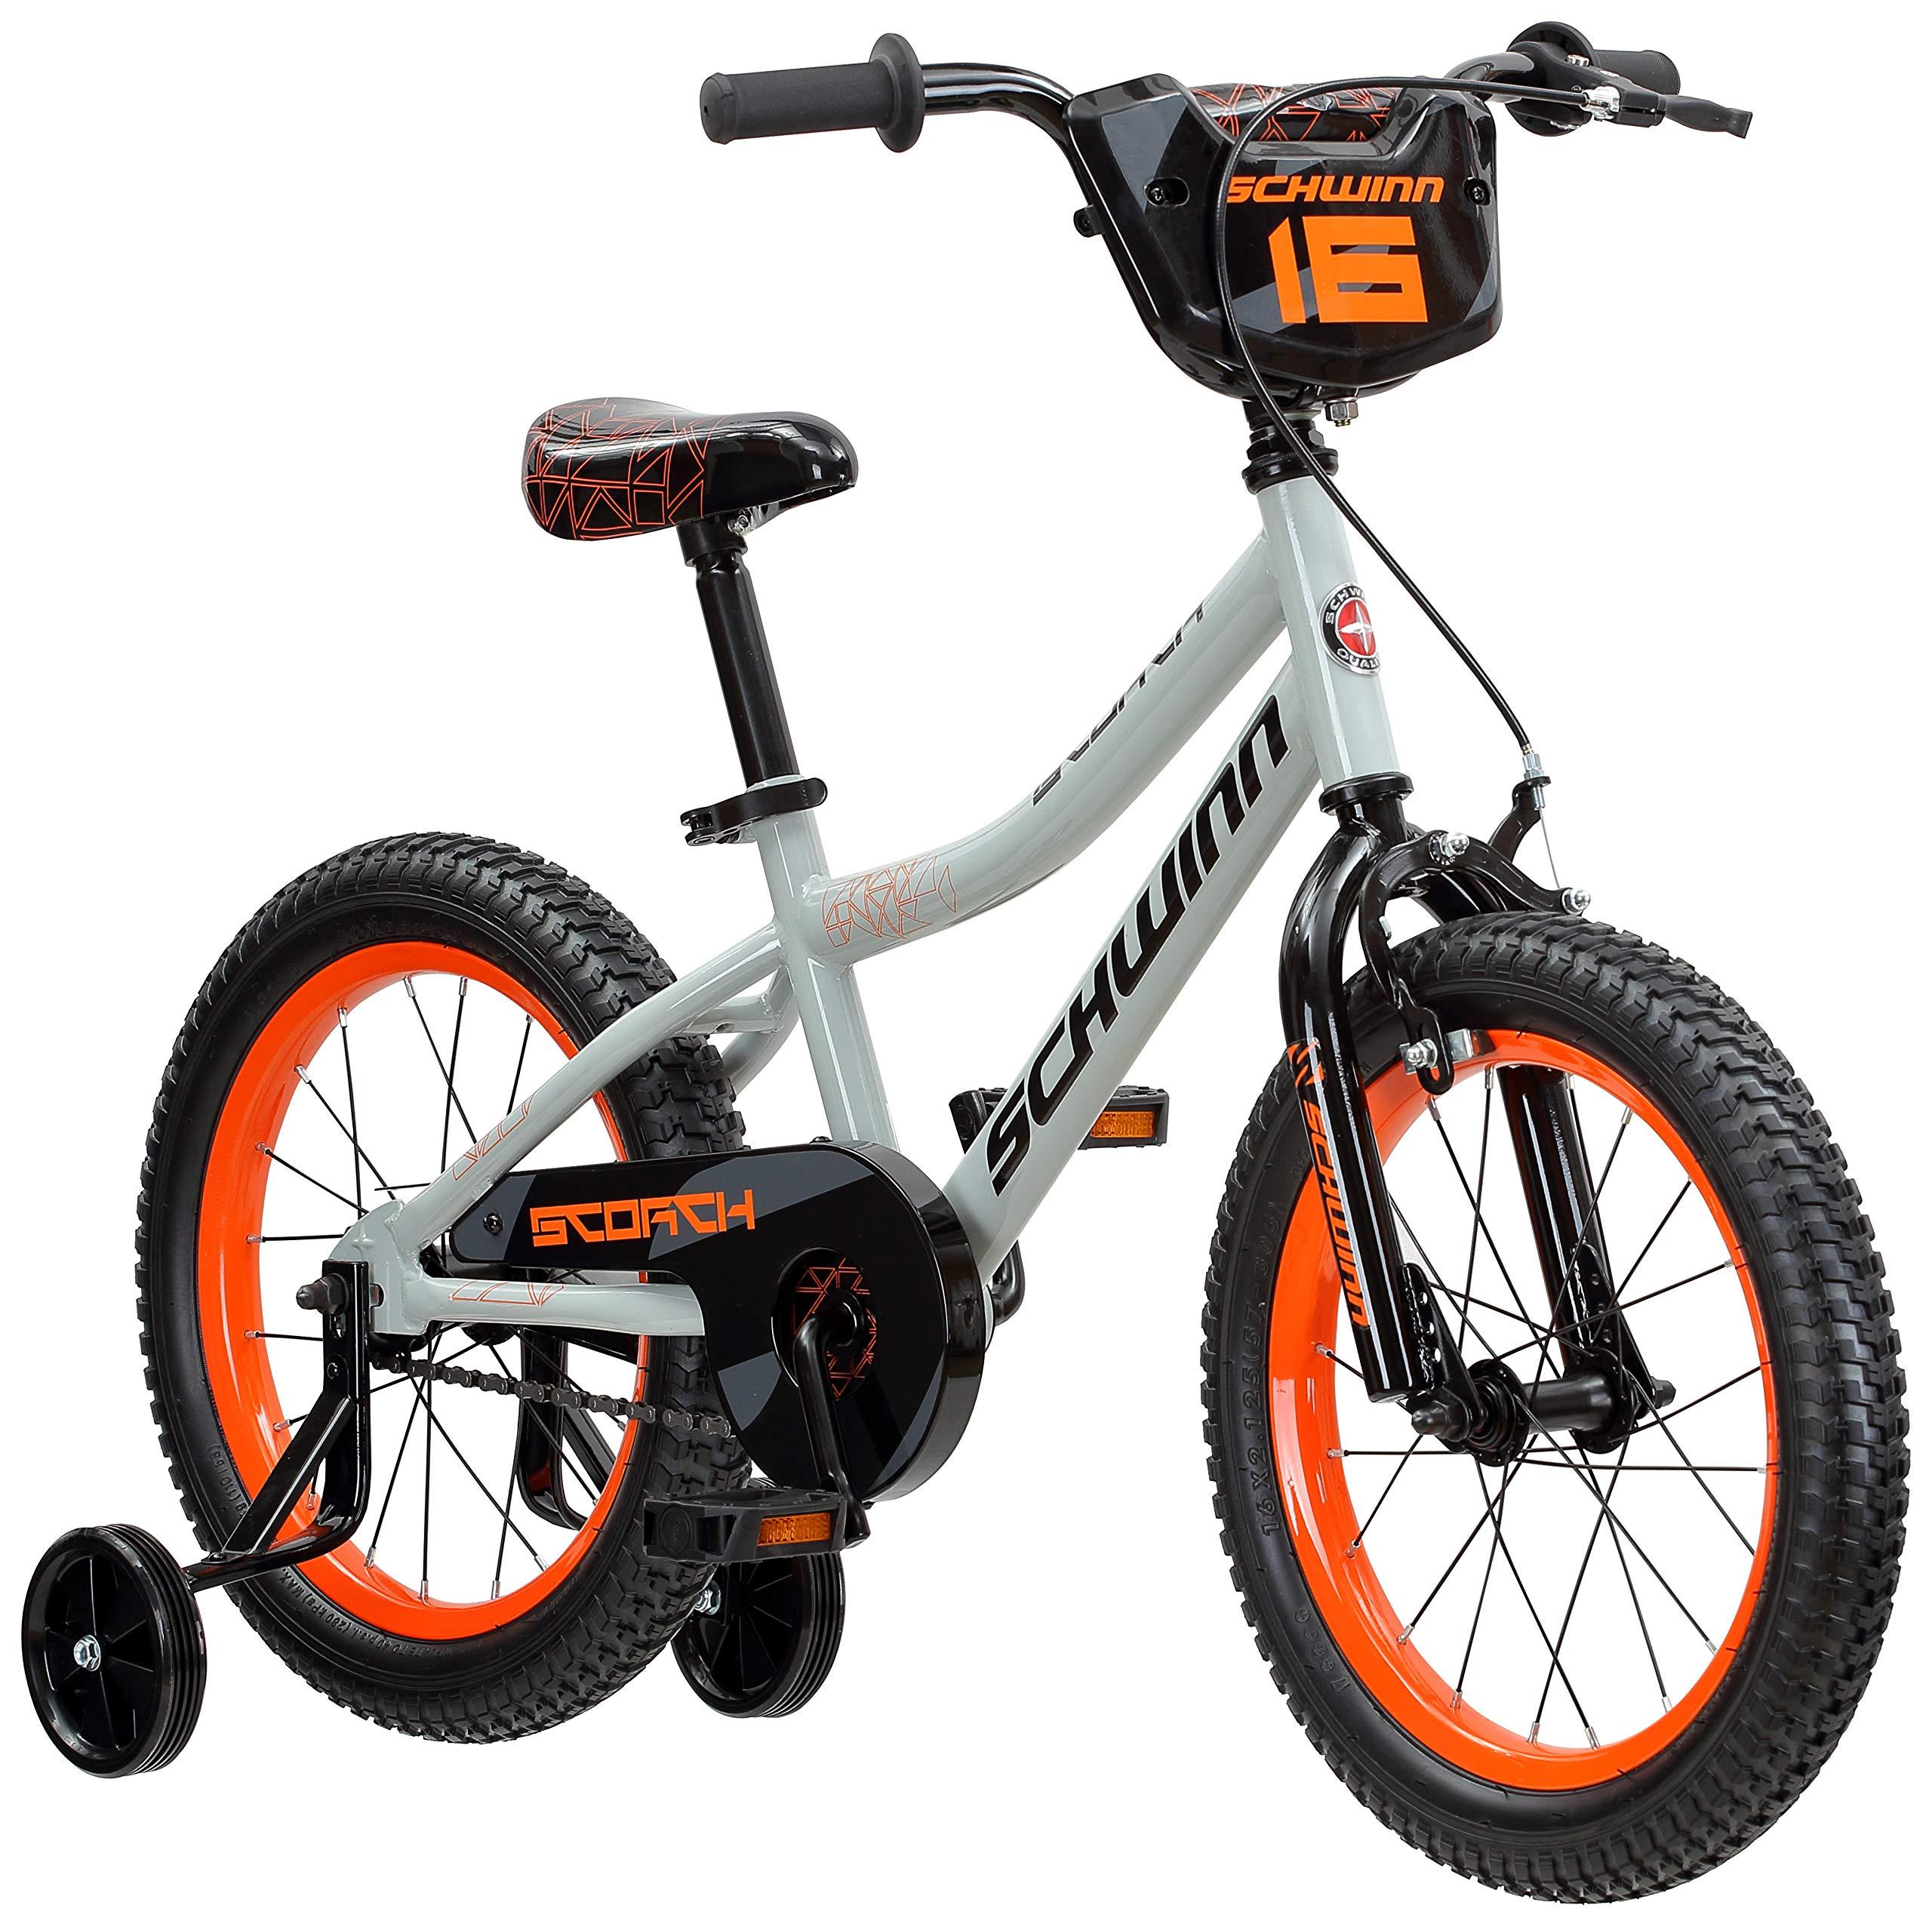 Schwinn Scorch Boy's Bike with Training Wheels, 16'' Wheels, Grey by Schwinn